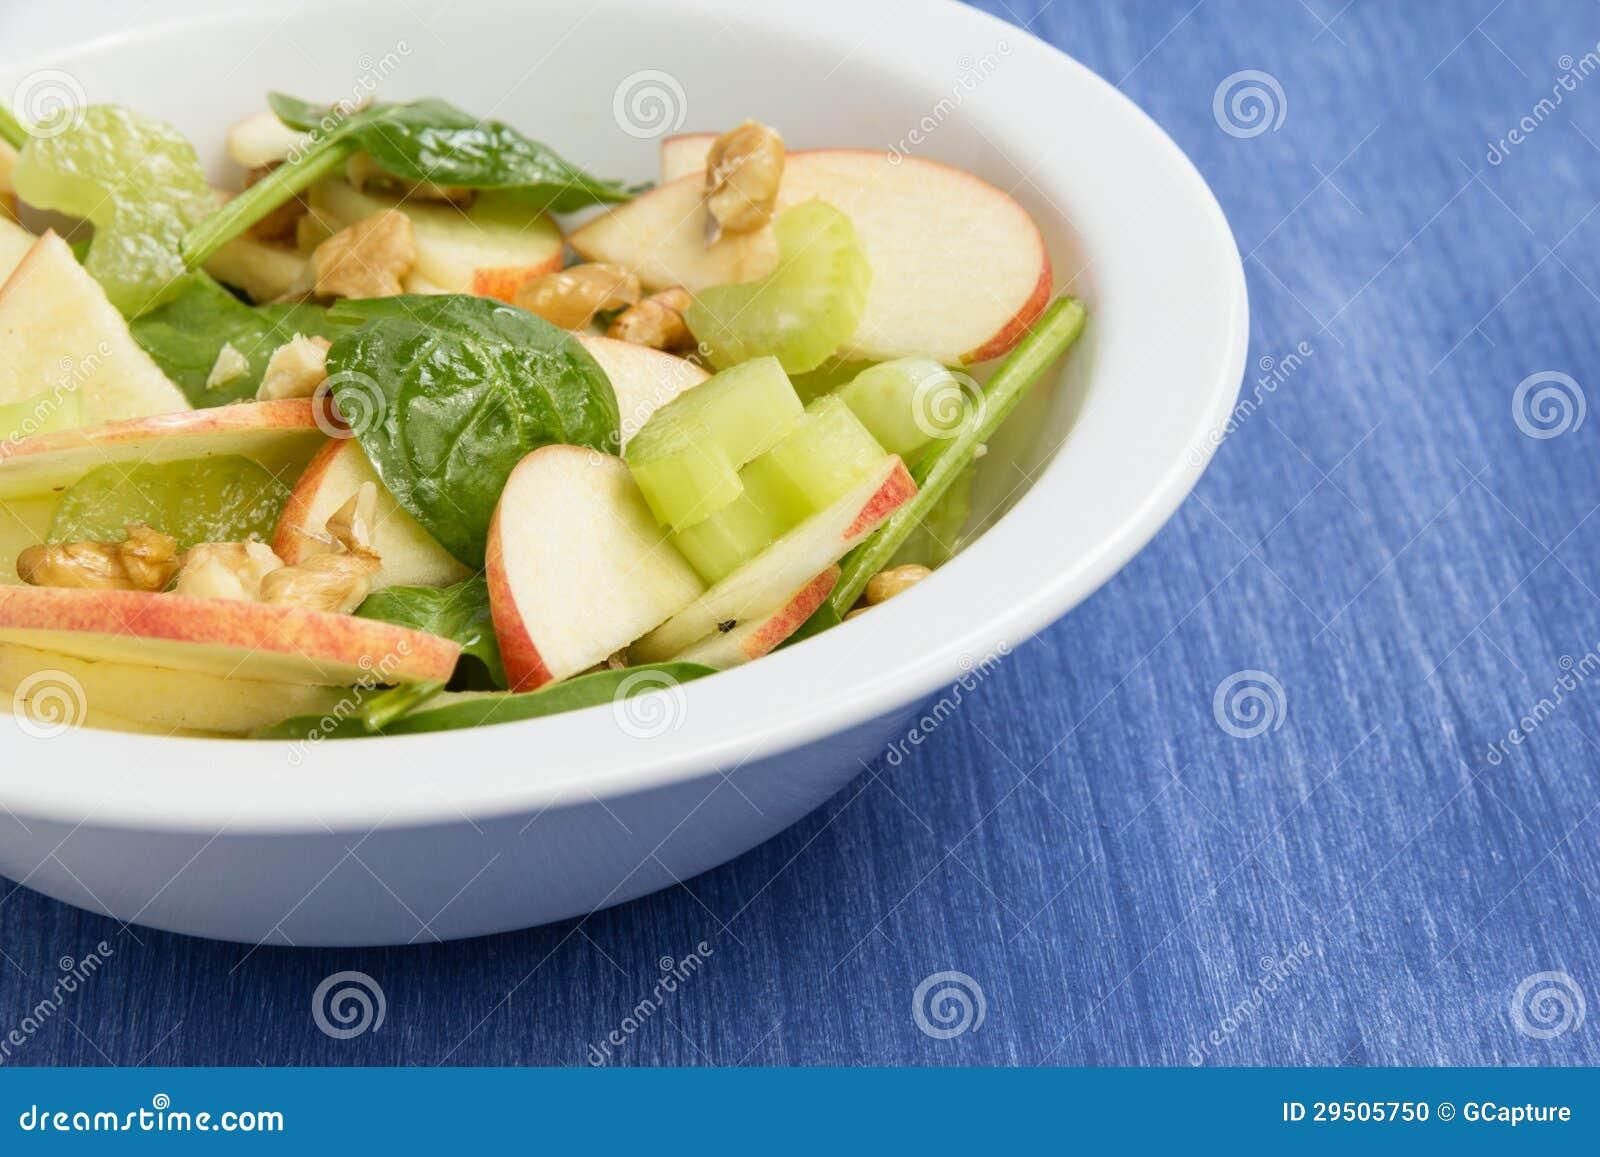 Moderne variatie van waldorfsalade